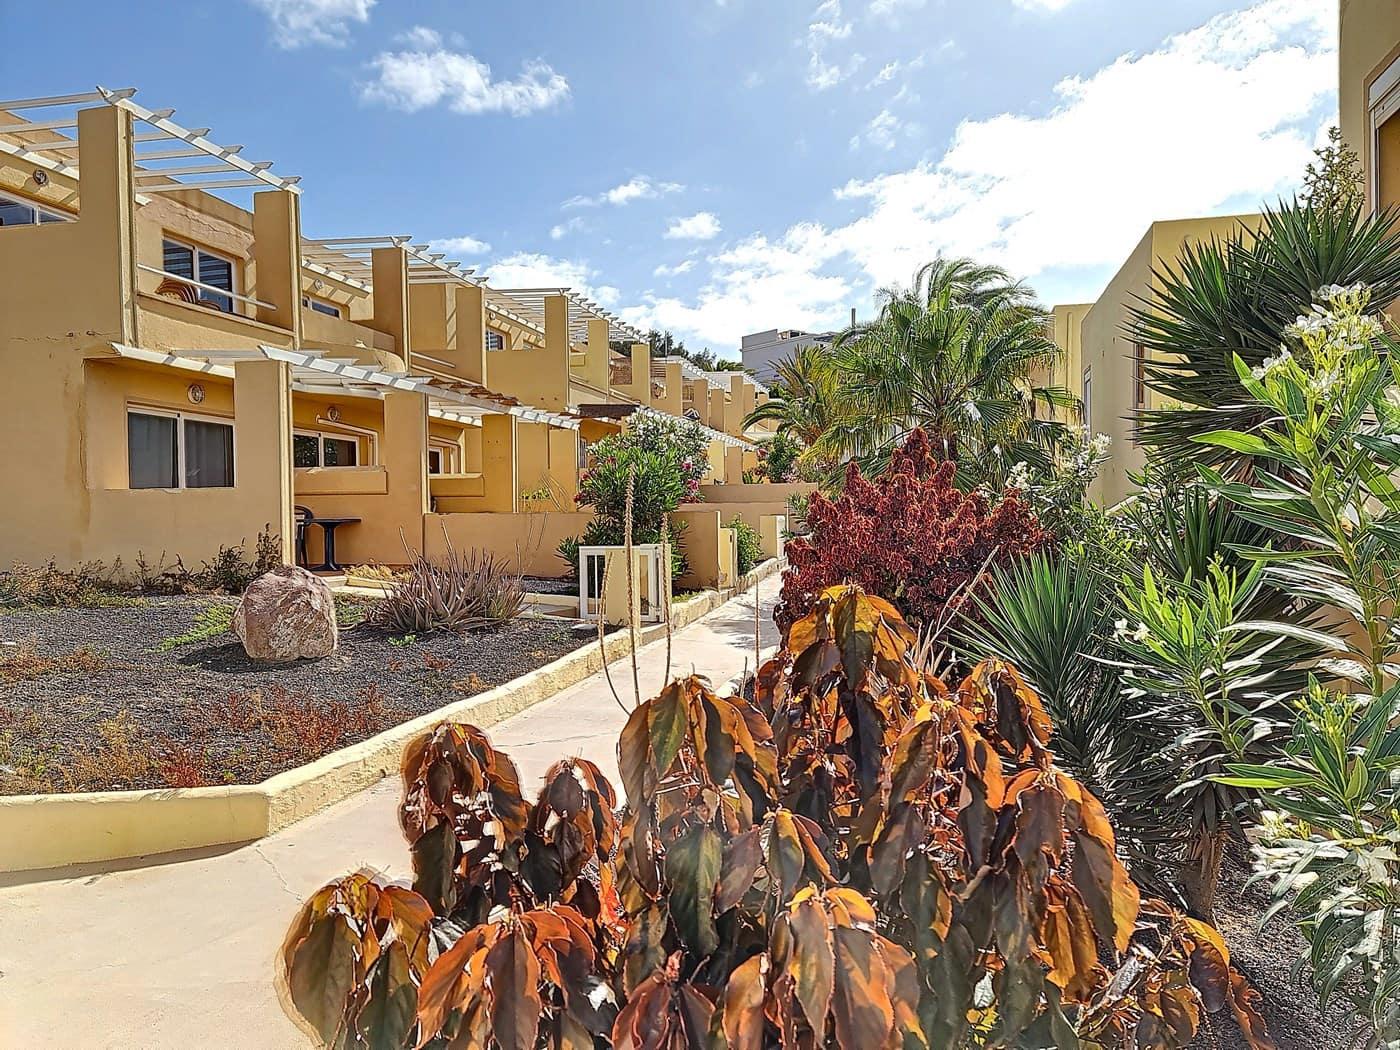 1 bedroom Apartment for sale in Costa Calma - € 85,000 (Ref: 4058257)